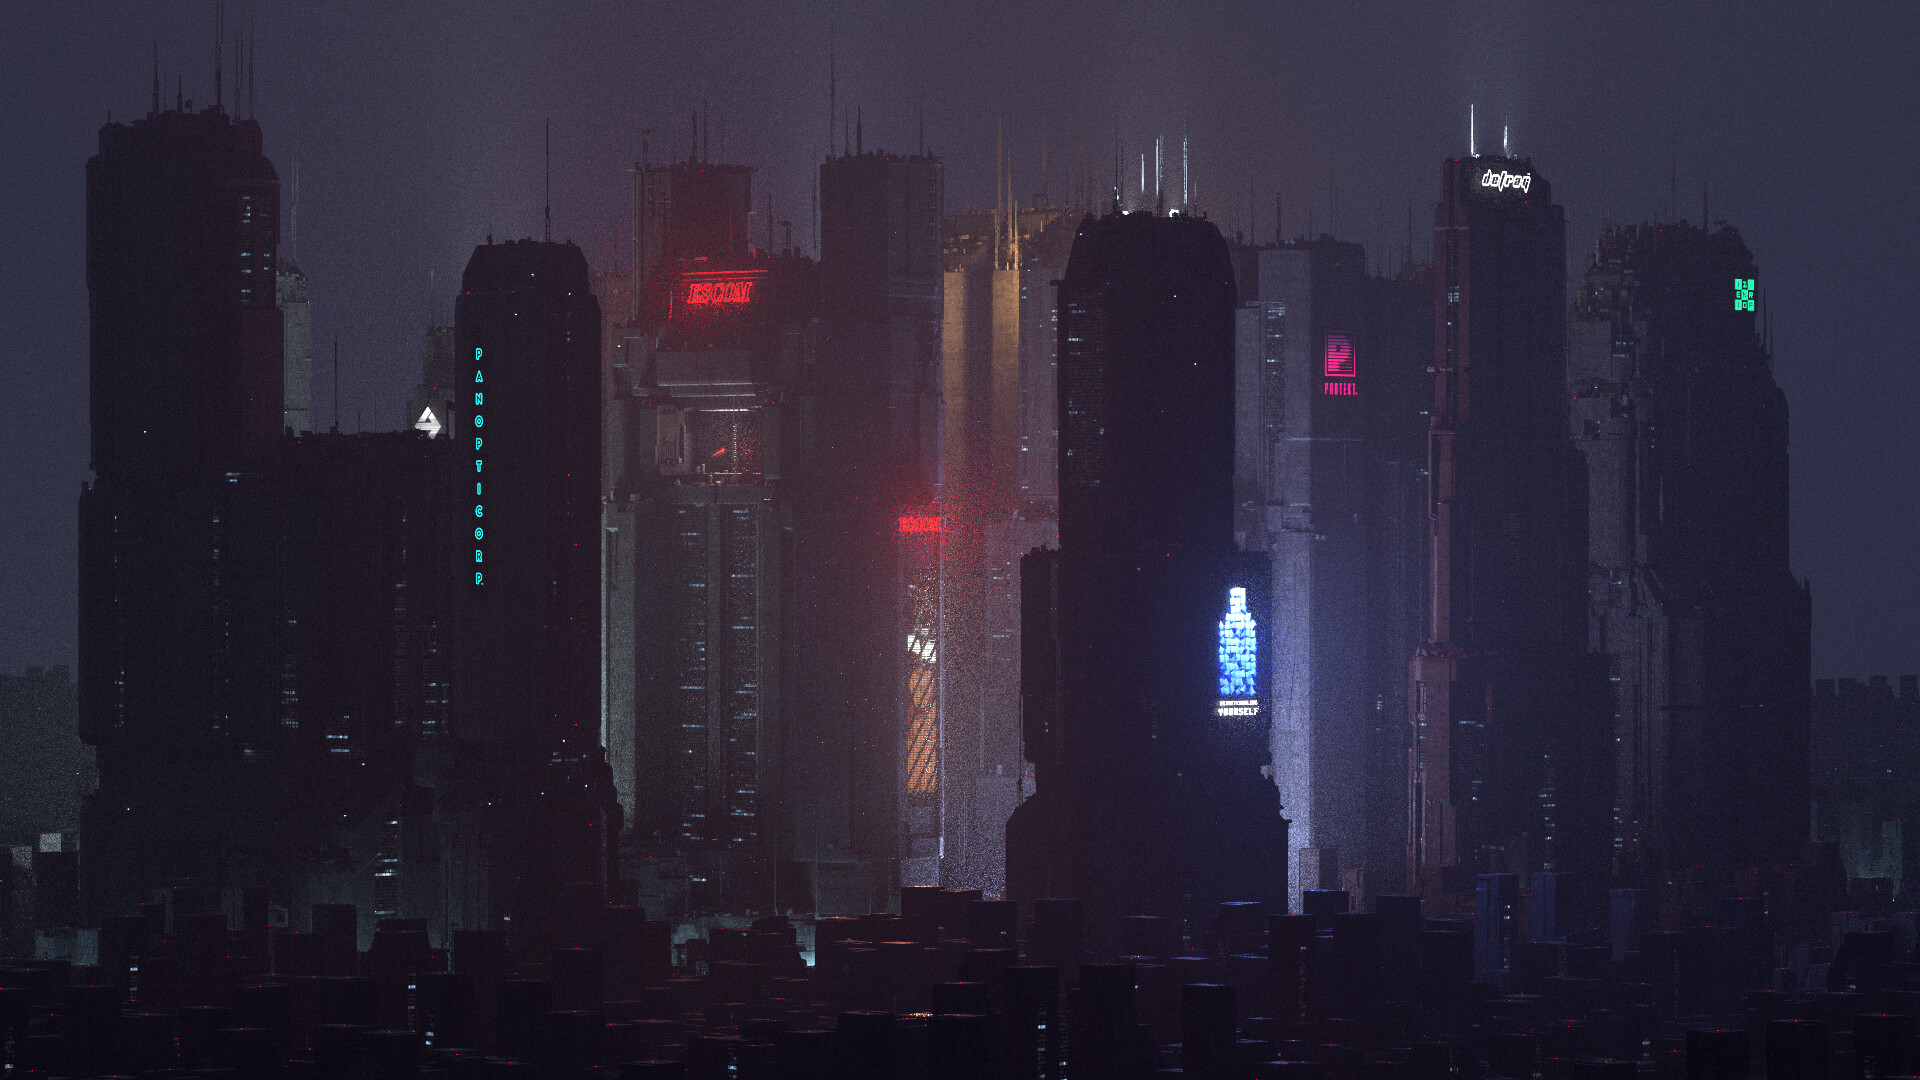 General 1920x1080 artwork digital art building futuristic cityscape city dark futuristic city cyberpunk